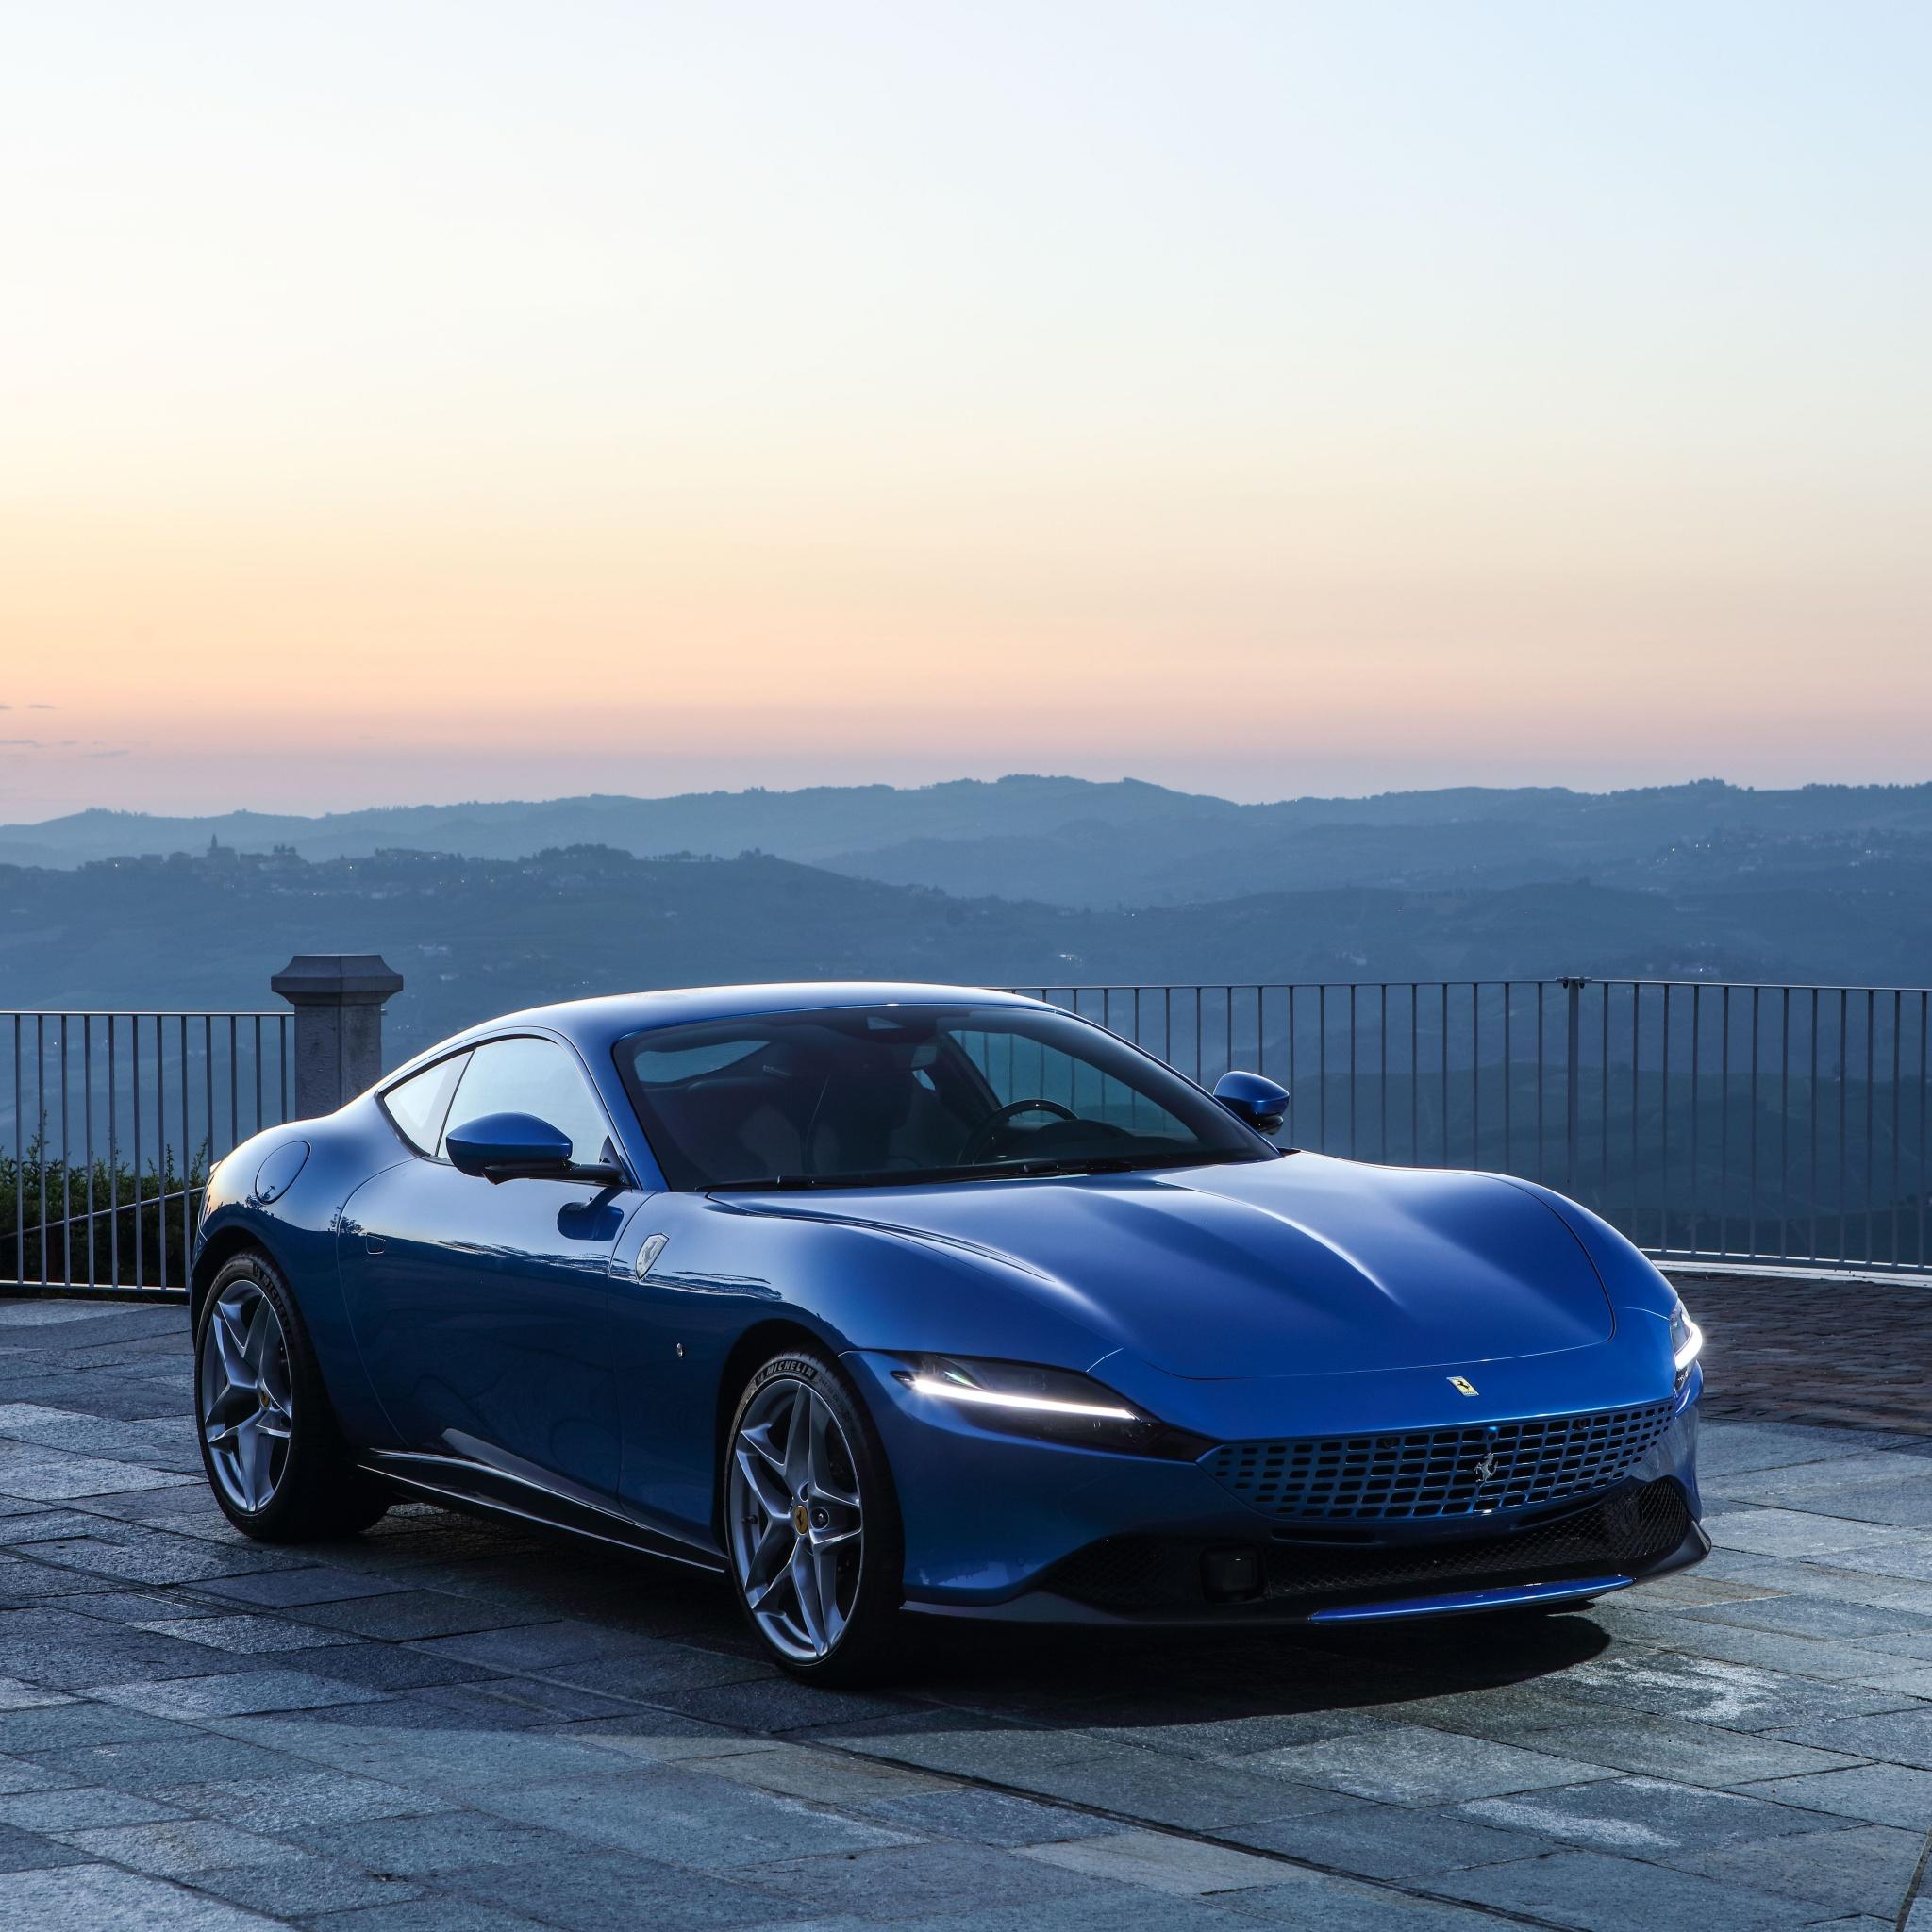 Ferrari Roma 4K Wallpaper, Sports cars, 2021, 5K, 8K, Cars ...